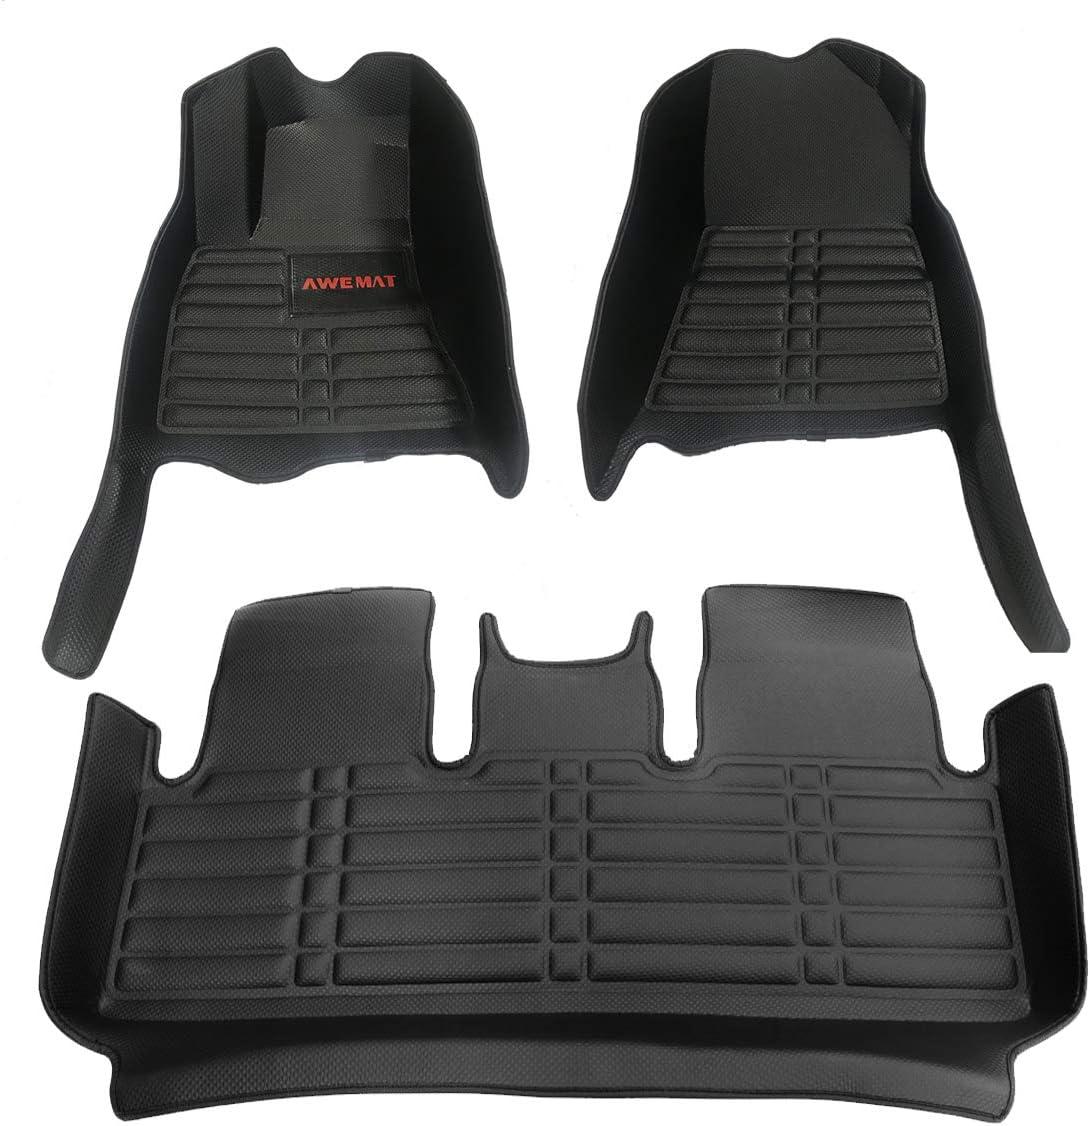 AWEMAT for Tesla Model 3 2017-2020 Model Digital Measured Exquisite Pattern Custom Fit Car Floor Mats for-Large Coverage -Waterproof-All Weather Protection-Black